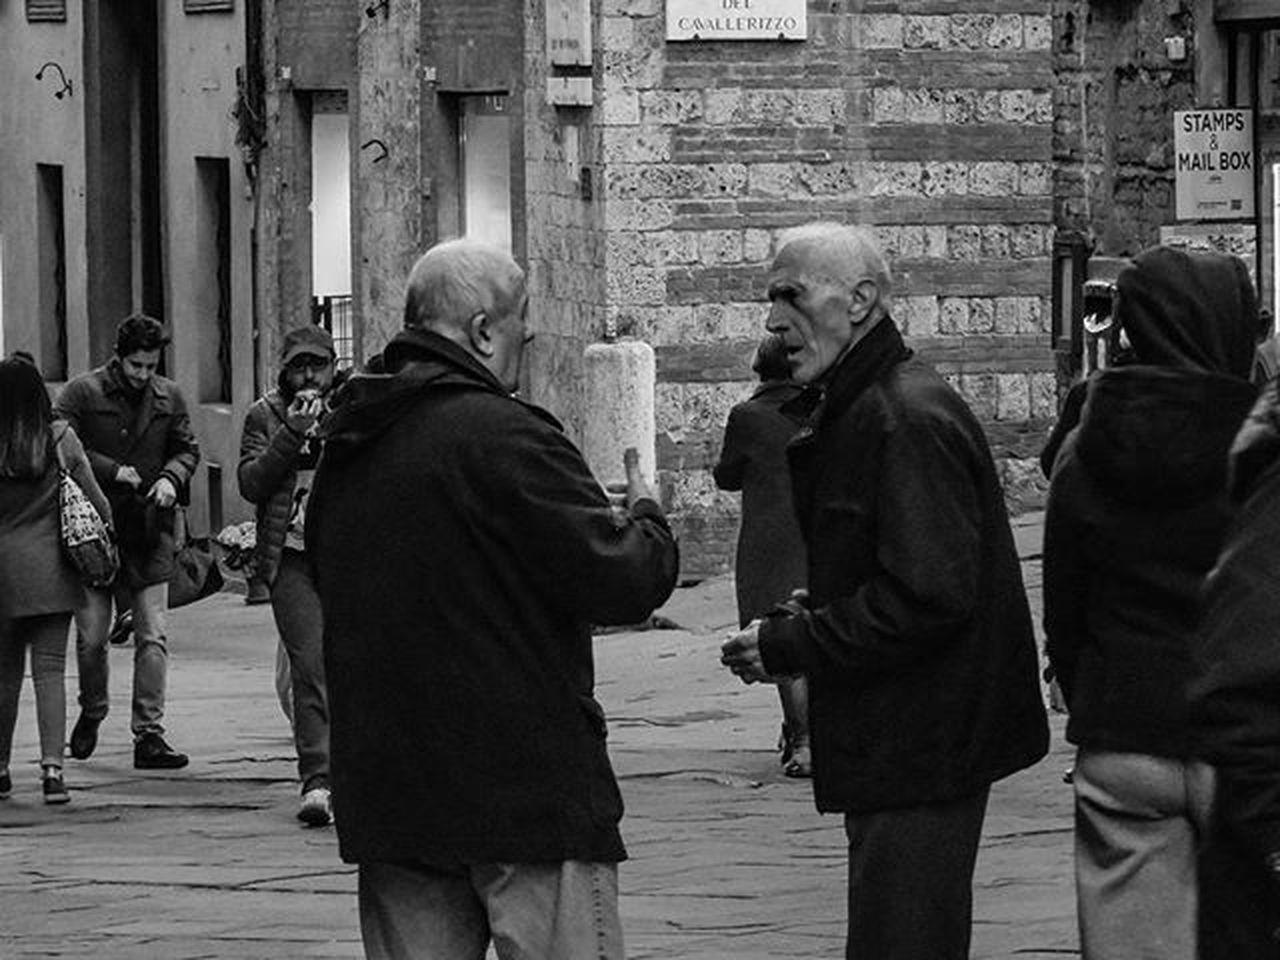 Di quel viaggio non ricordo più niente. Ero troppo occupato a fotografare e non ho guardato. ●Umberto Eco● Umbertoeco Biancoenero Blackandwhite Bw Bnw Monochrome Italy Italia Picoftheday Photooftheday Streetphotography Street Roma Rome Milano Toscana Igersitalia Firenze Tuscanybuzz Siena Piazzadelcampo Igerstoscana Igerssiena Pisa Ig_siena ig_toscana buonanotte goodnight primavera spring